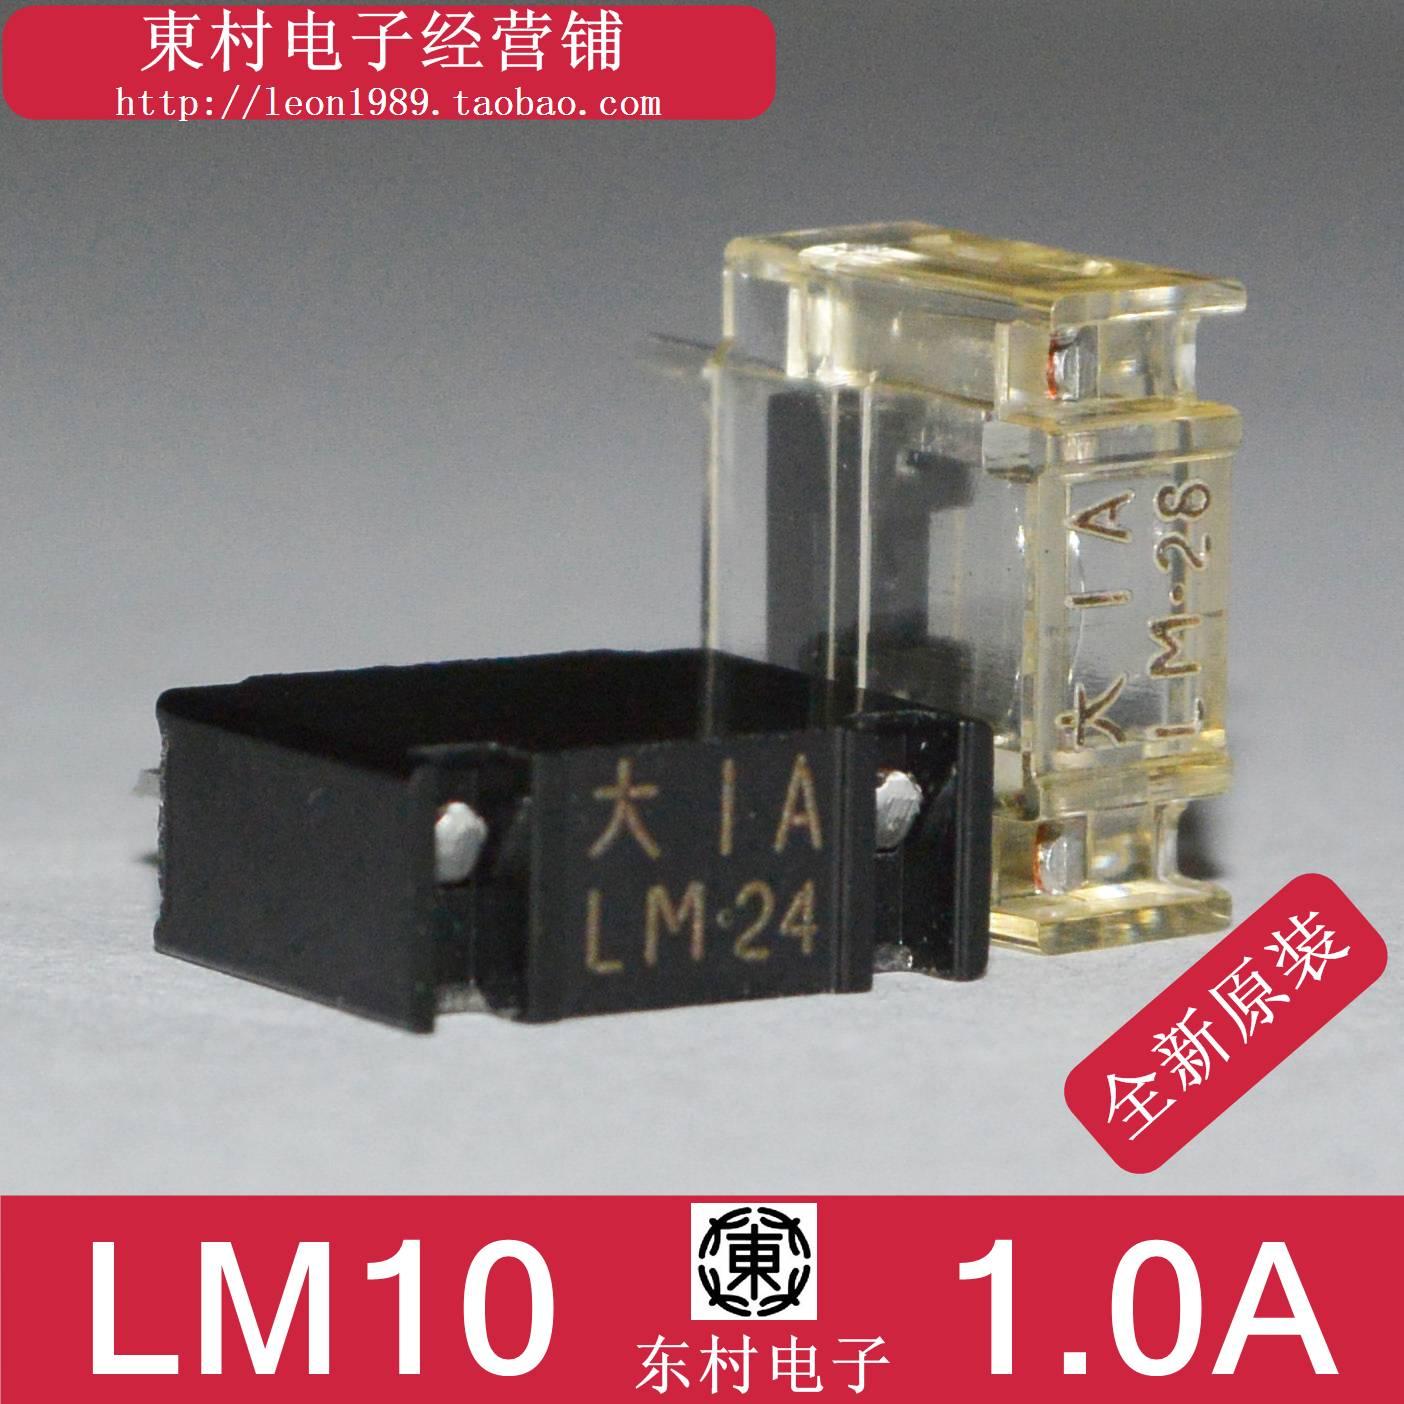 Japón fusible FANUC sistema FANUC fusible LM10 gran 1A LM1A Saito fusible